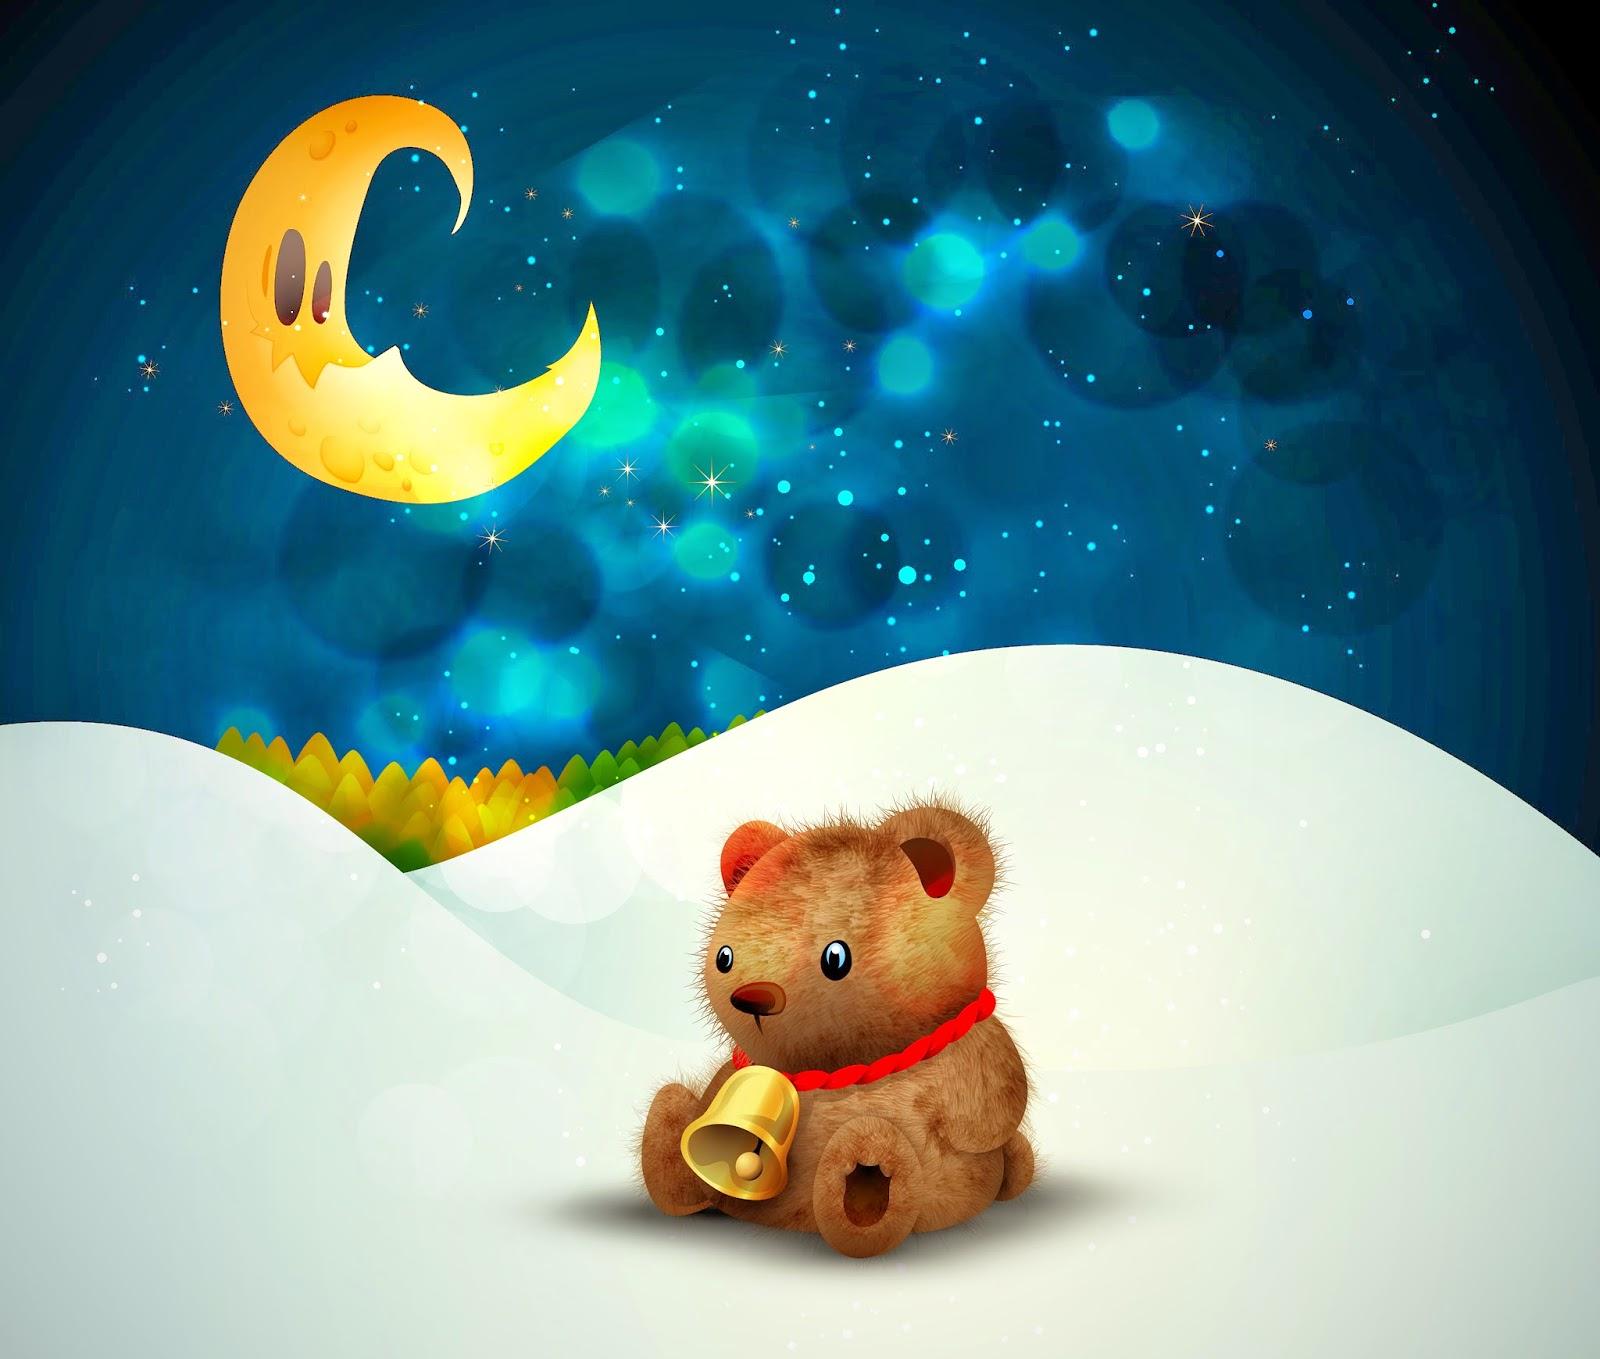 cute-little-teddy-bear-christmas-snow-moon-night-stars-image-x-wallpaper-wp3804277